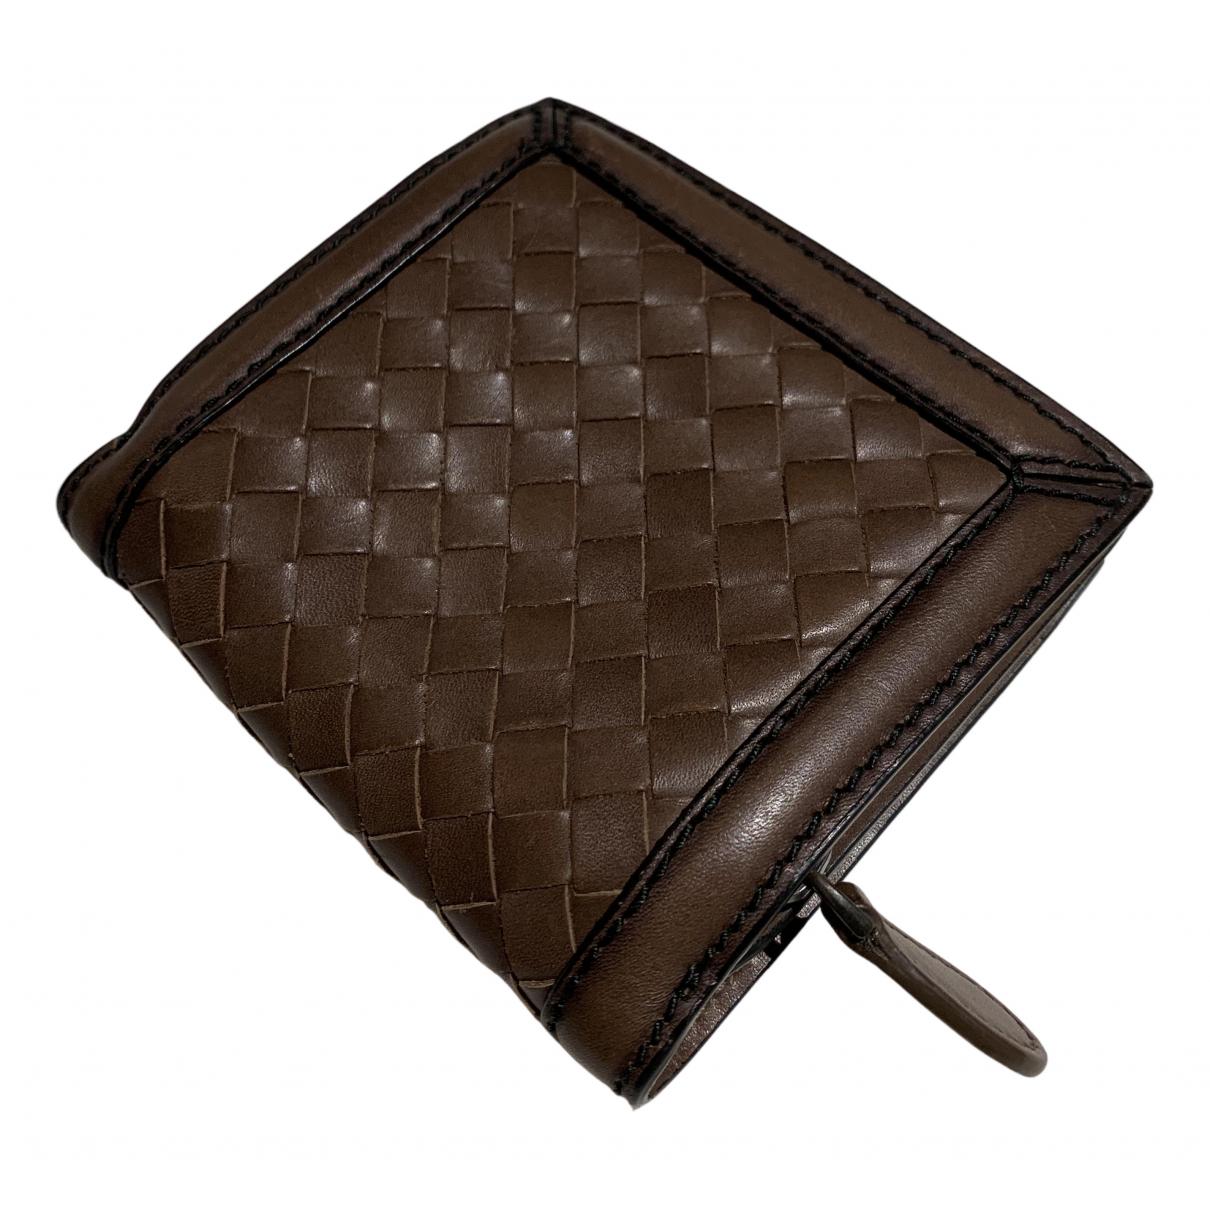 Bottega Veneta N Brown Leather Purses, wallet & cases for Women N